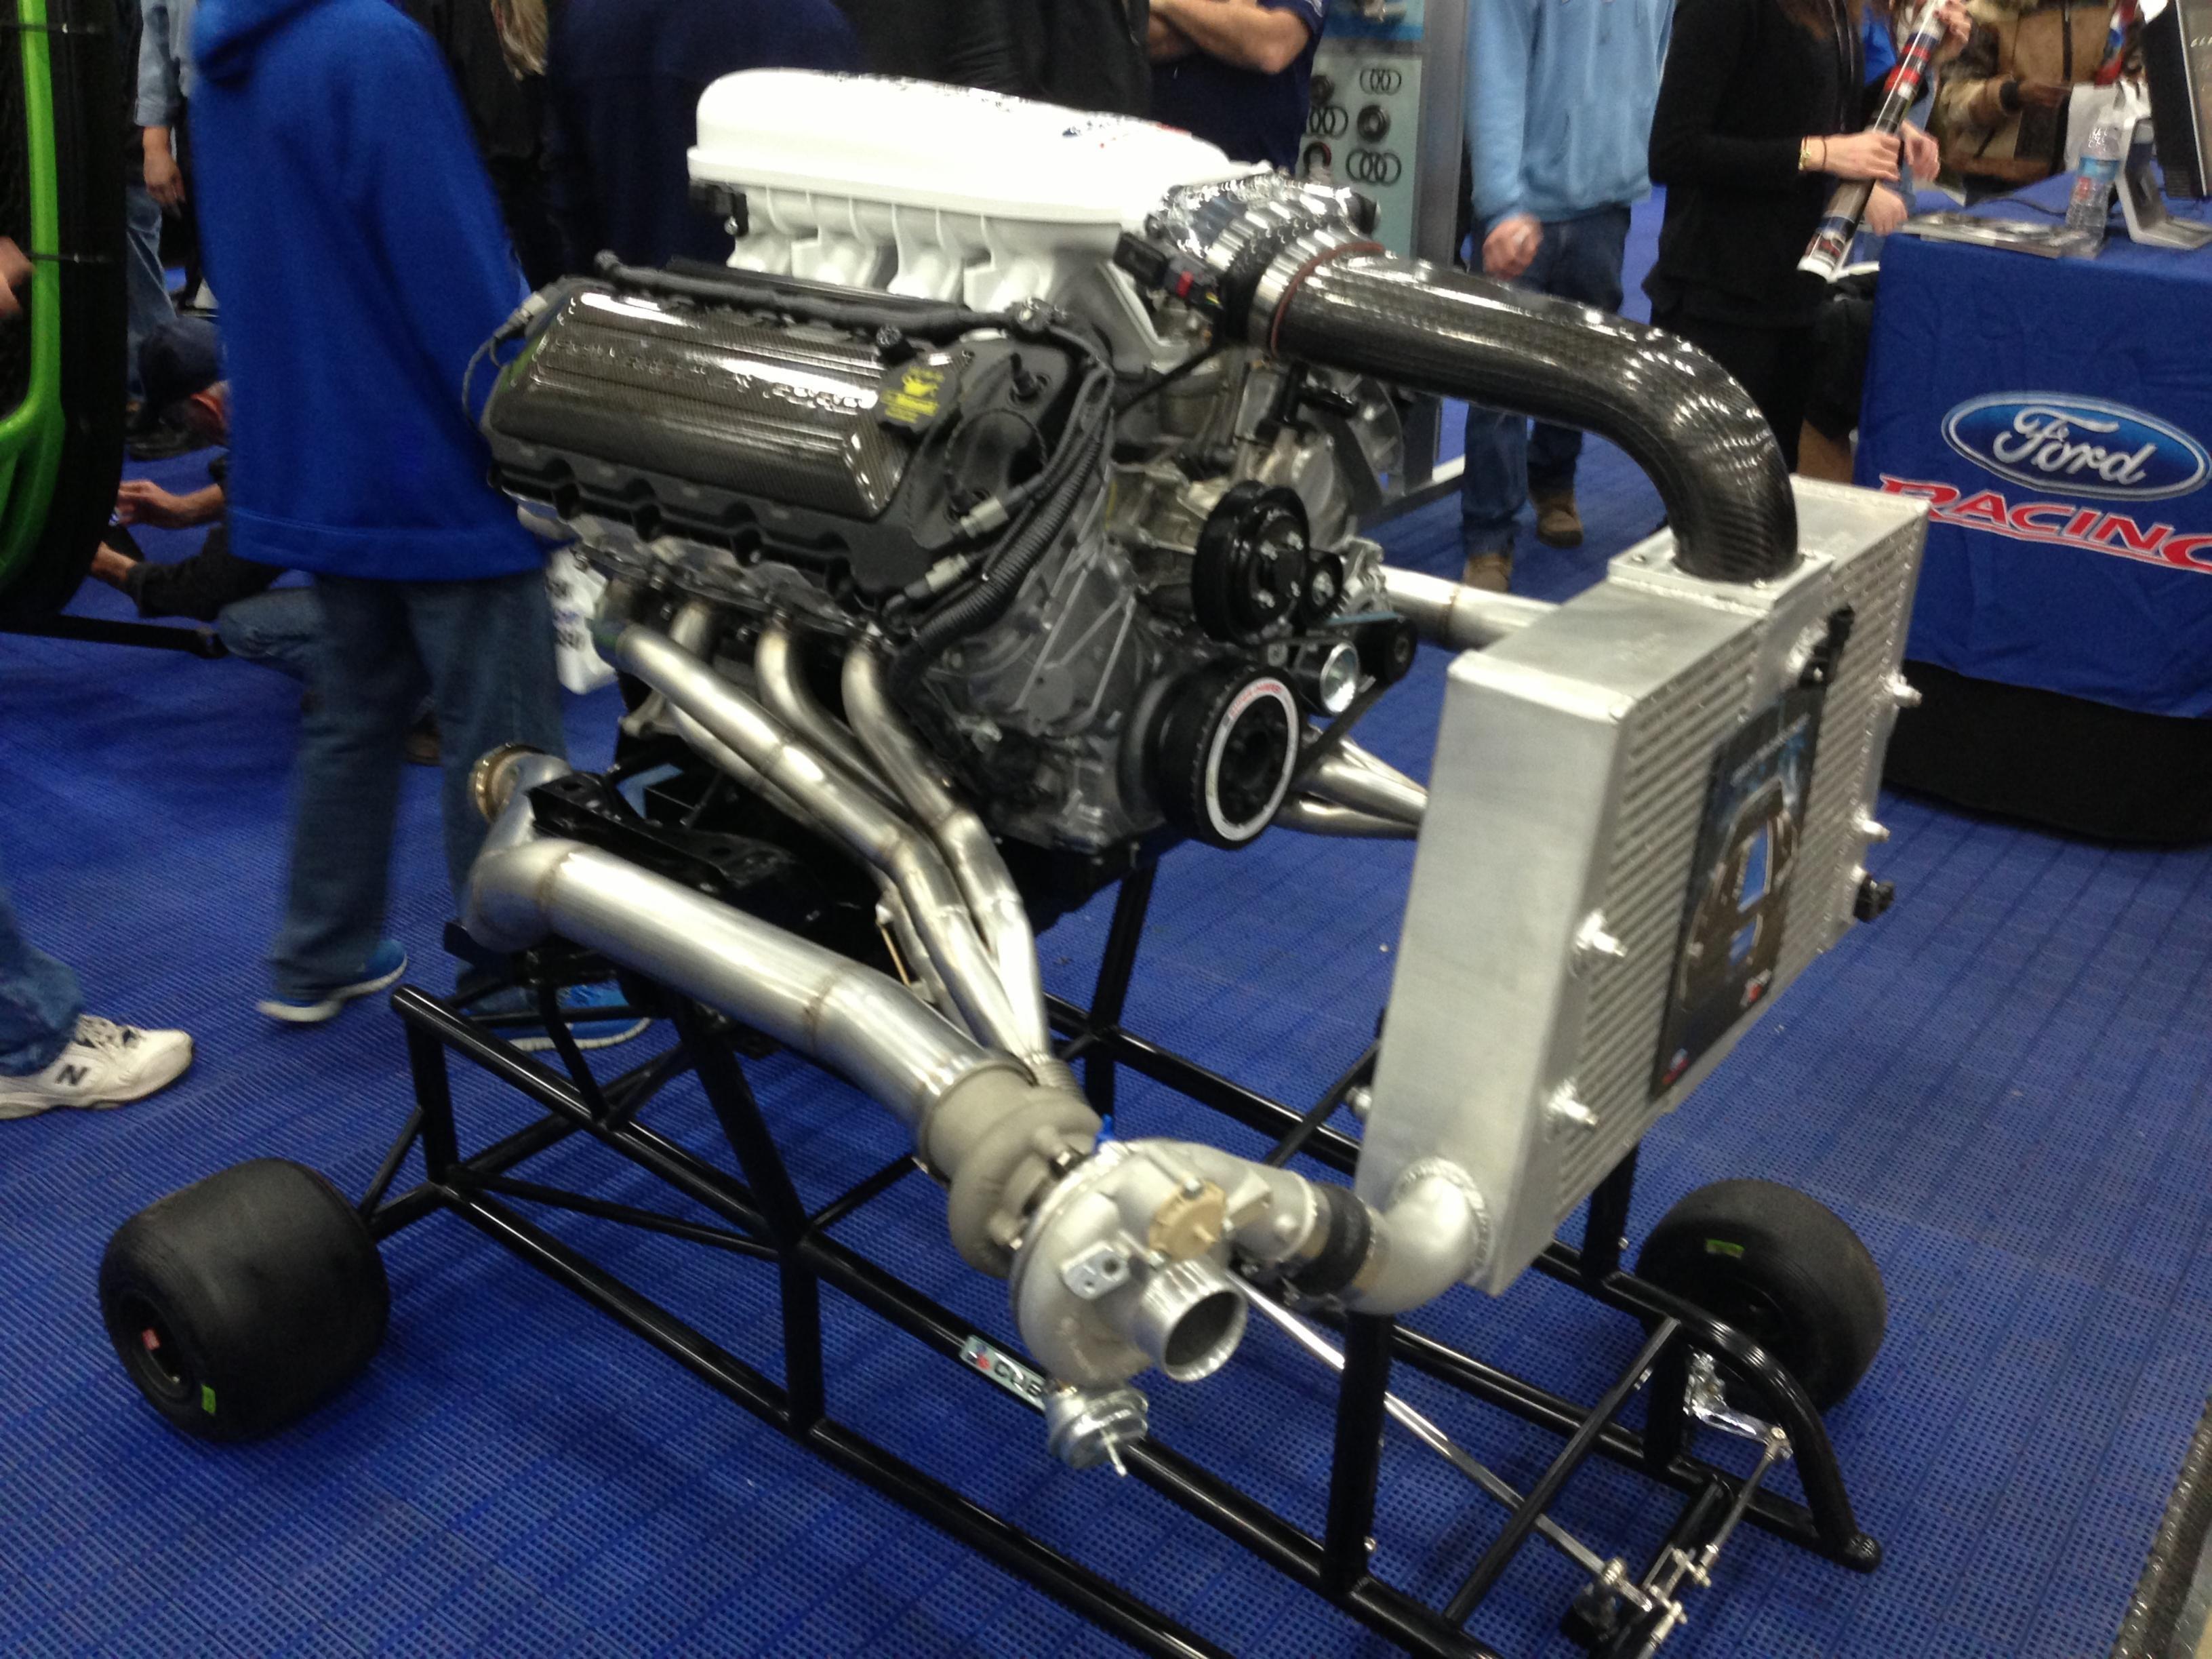 Twin Turbo Cobra Jet Engine pics - Ford Mustang Forum